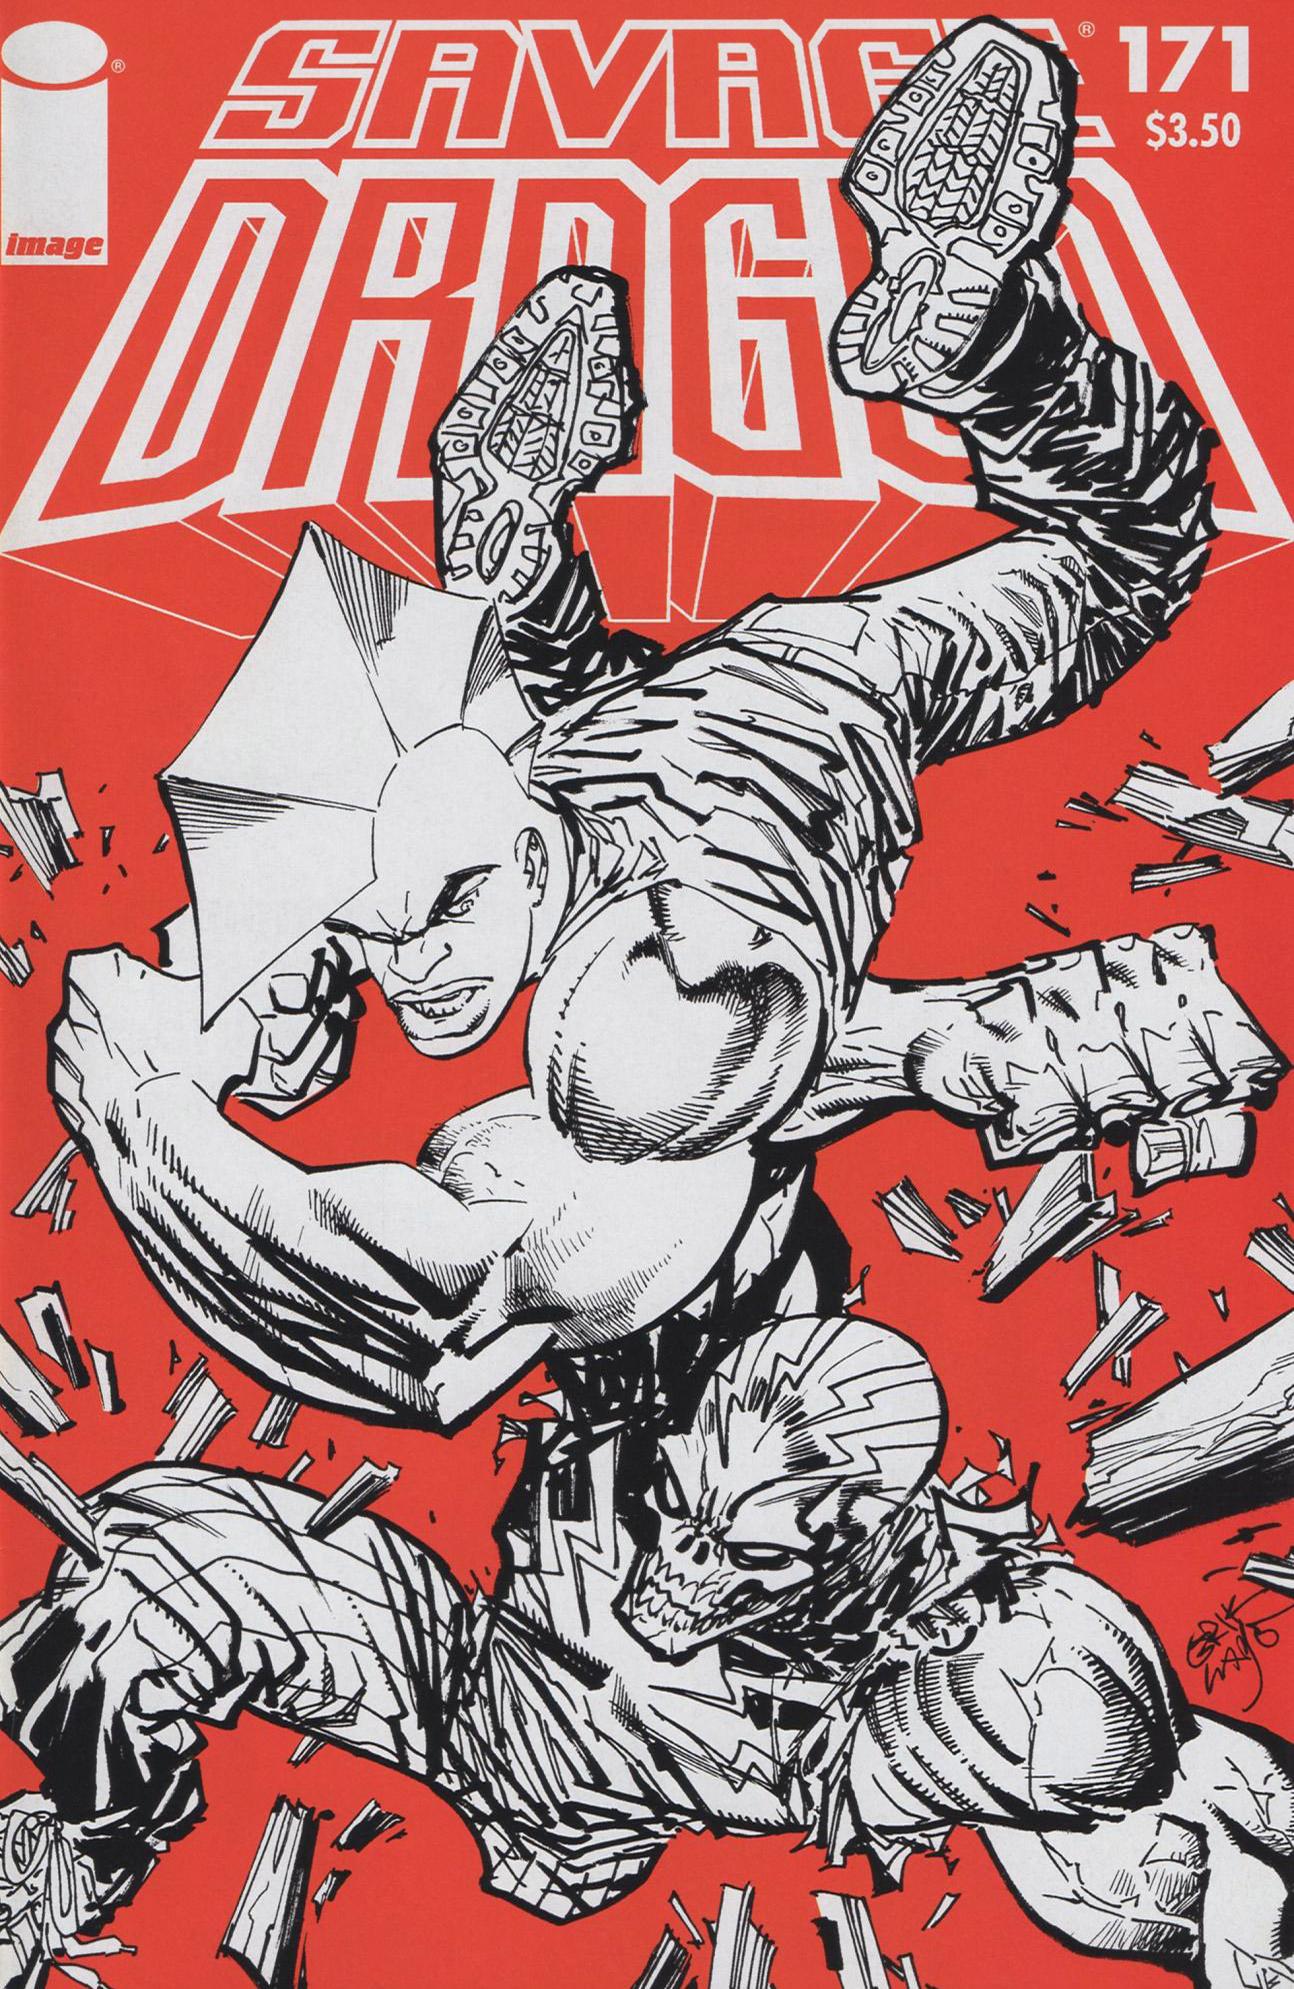 Cover Savage Dragon Vol.2 #171